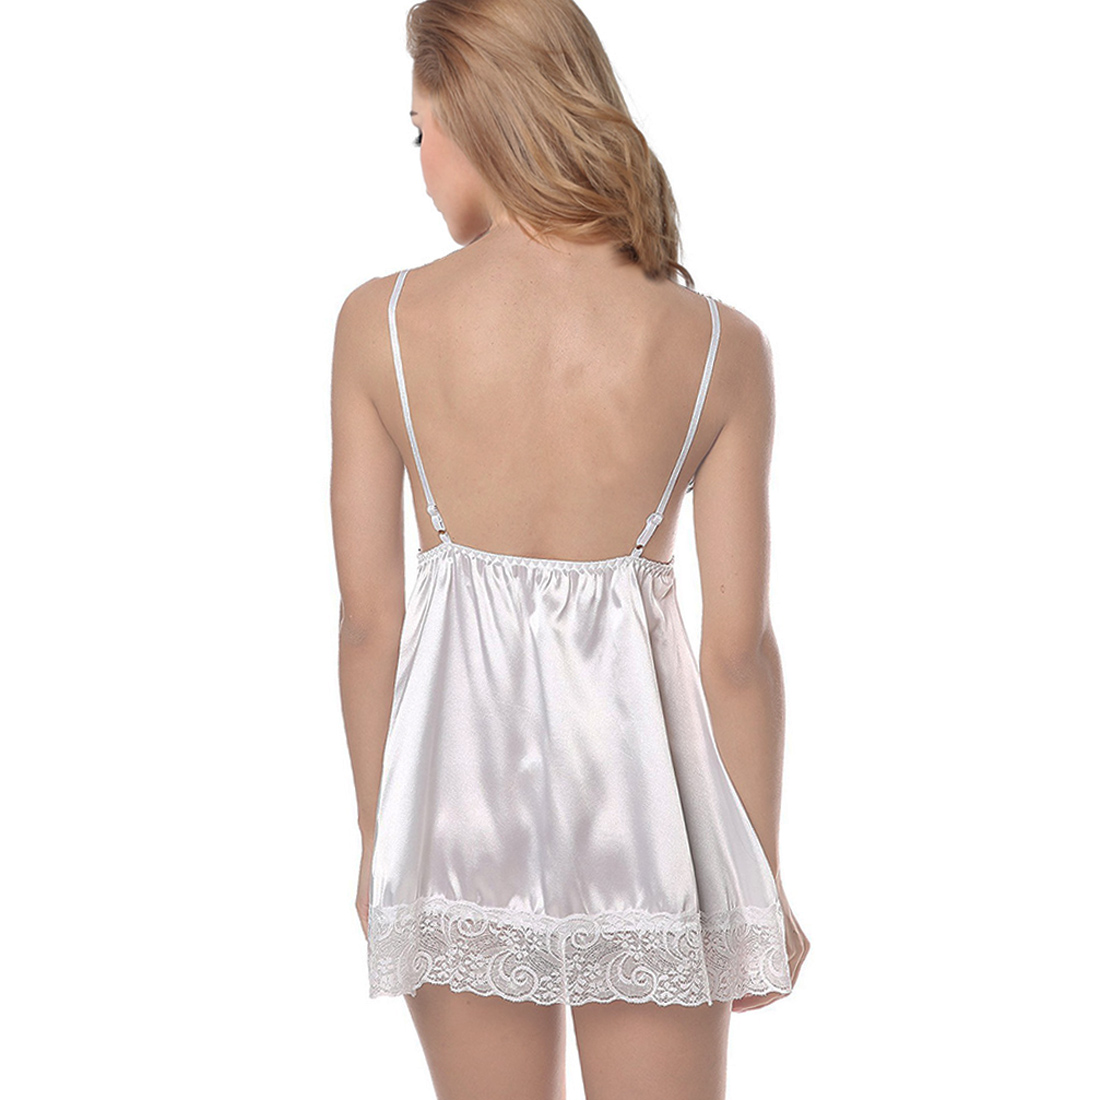 Womens Sleepwear White Lace Satin Chemise Nightwear ...